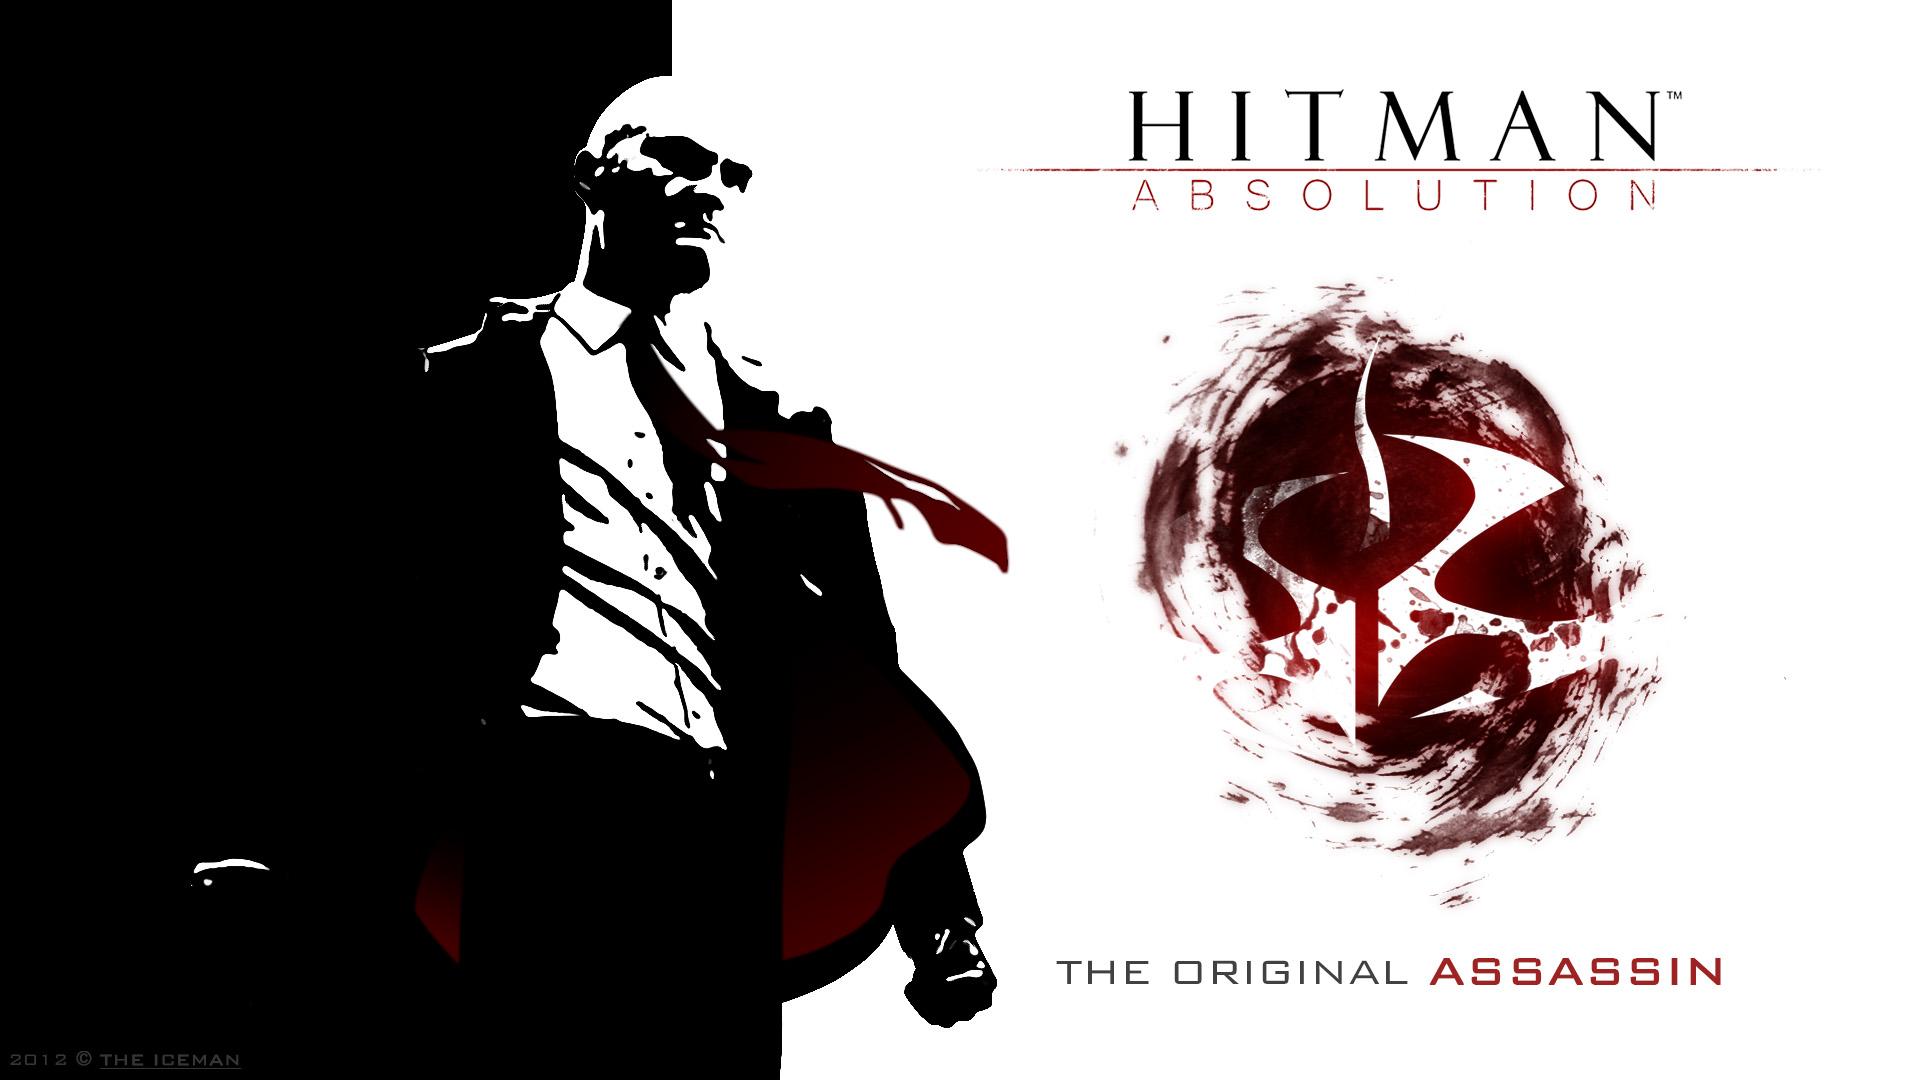 Hitman hd clipart 1080p.